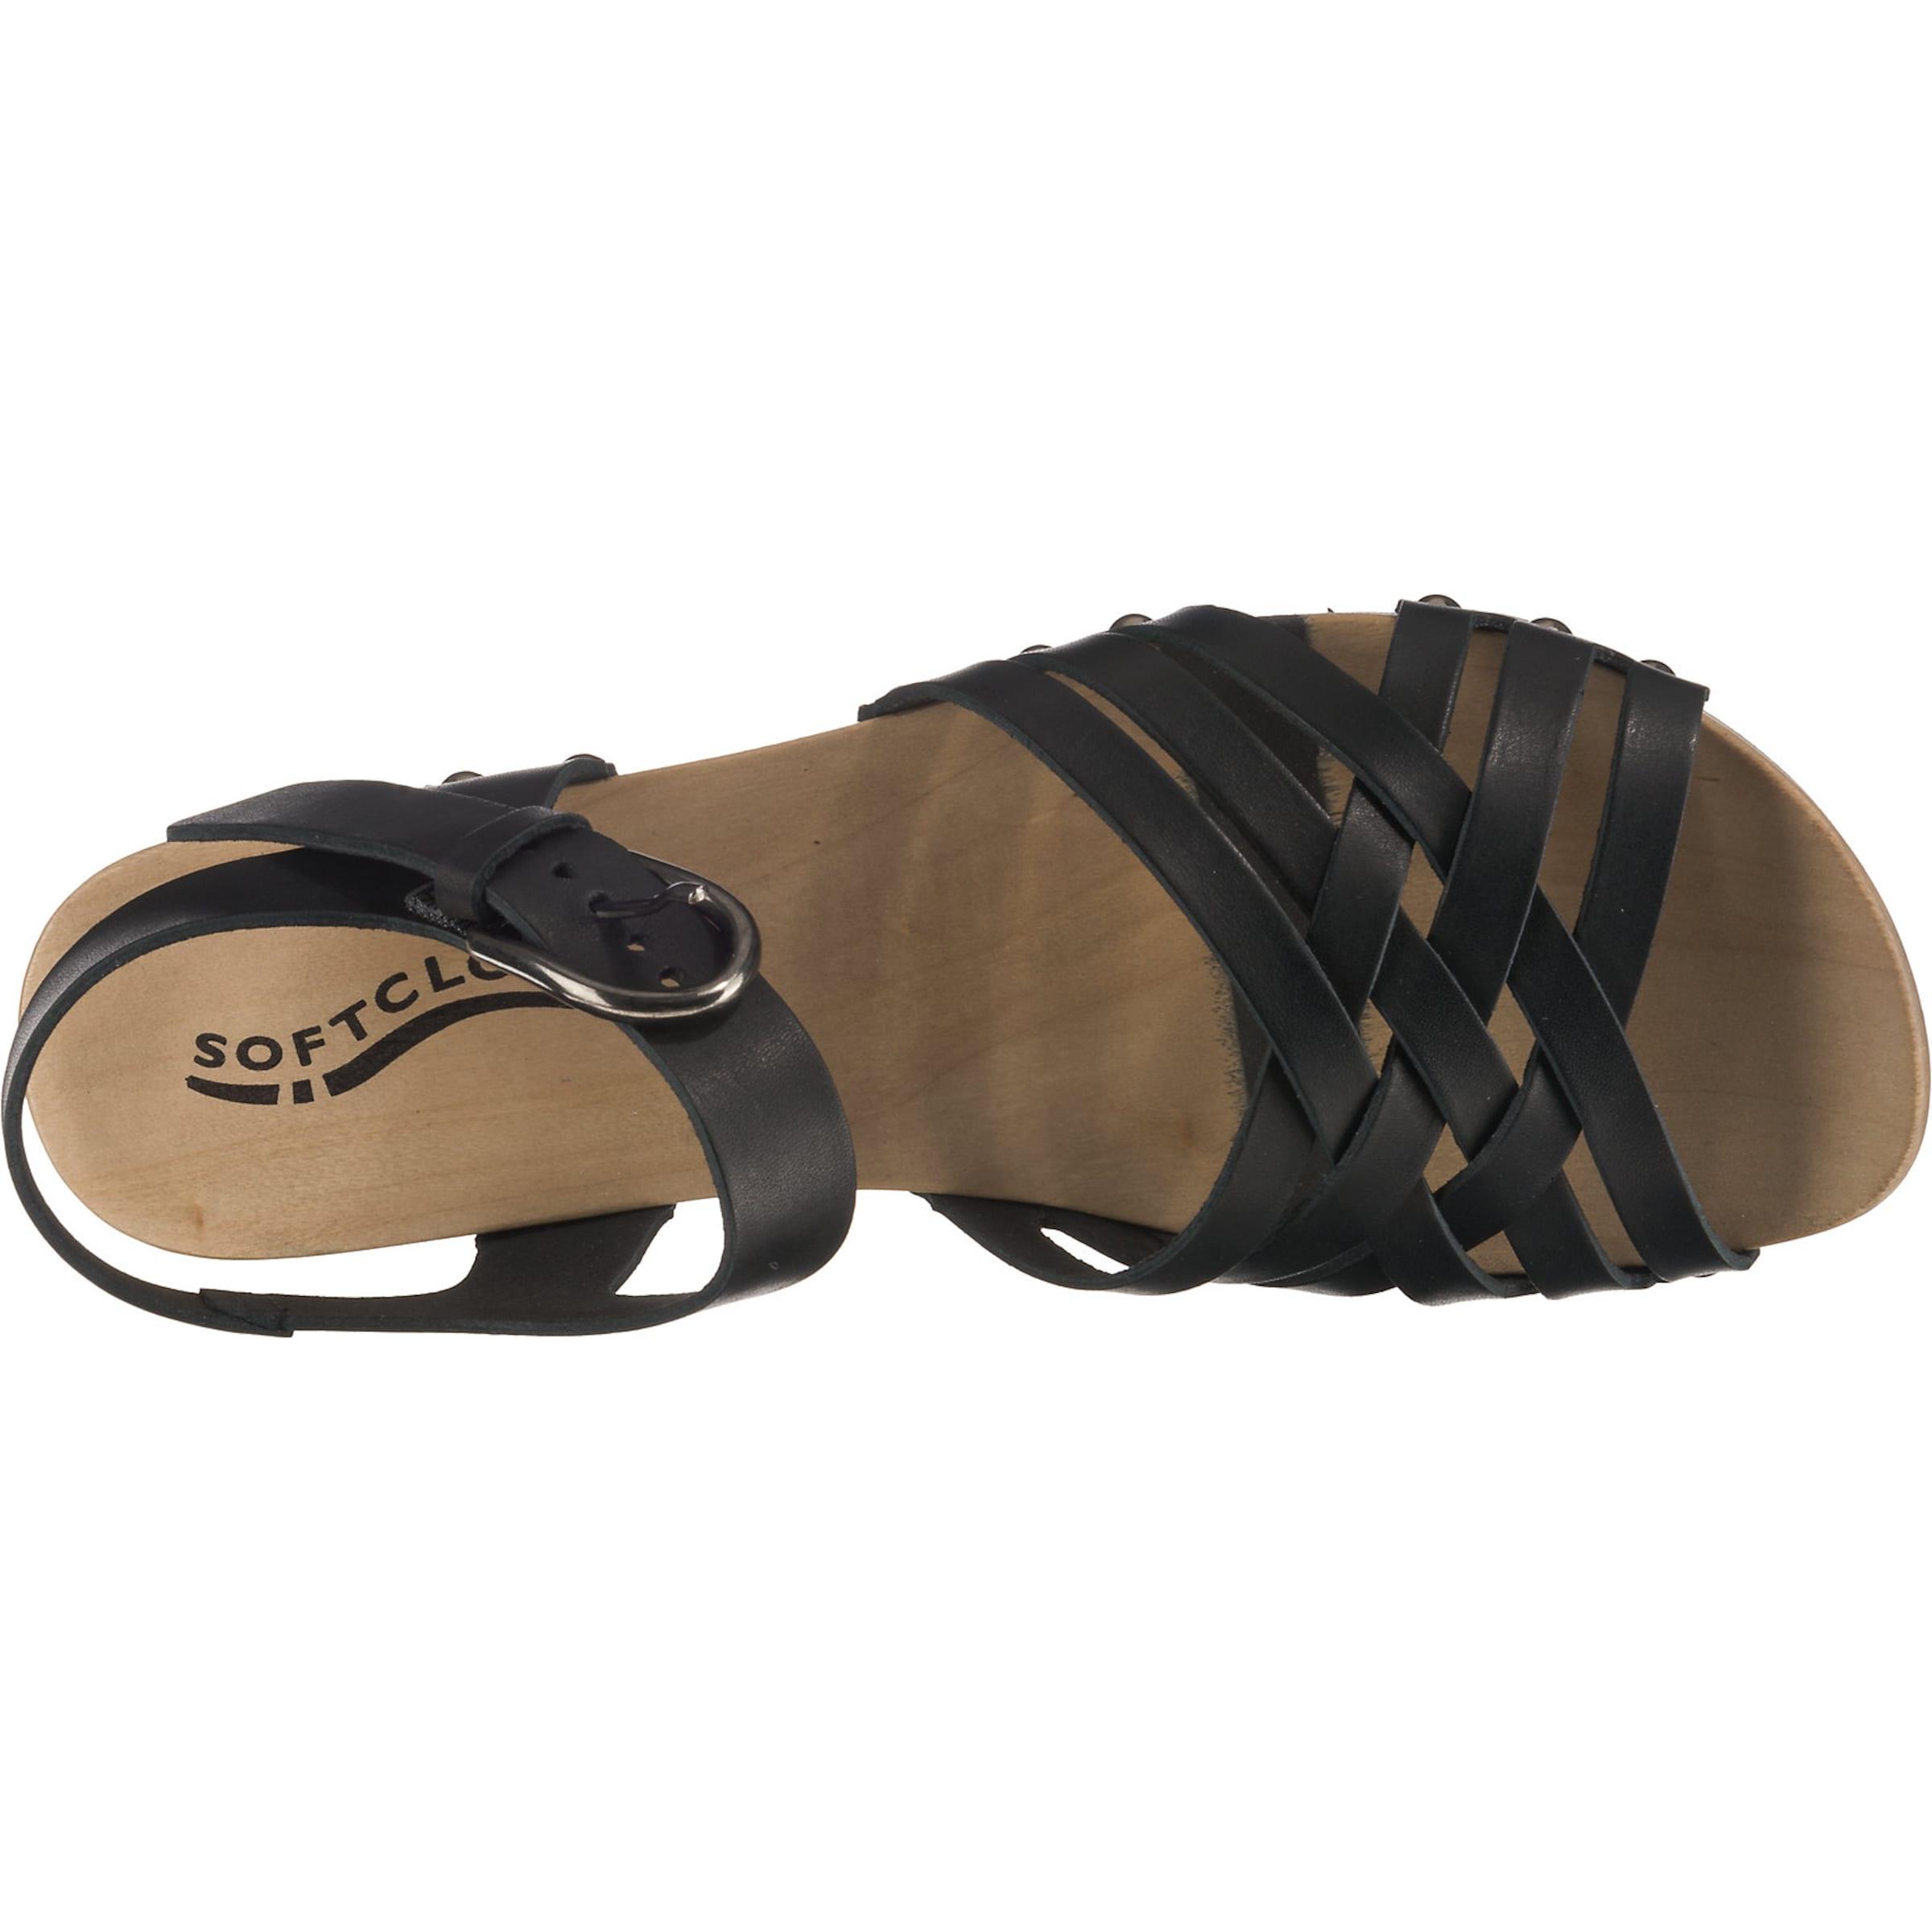 sandaletten Schwarz In 'pamina' Softclox Plateau sQBordthCx